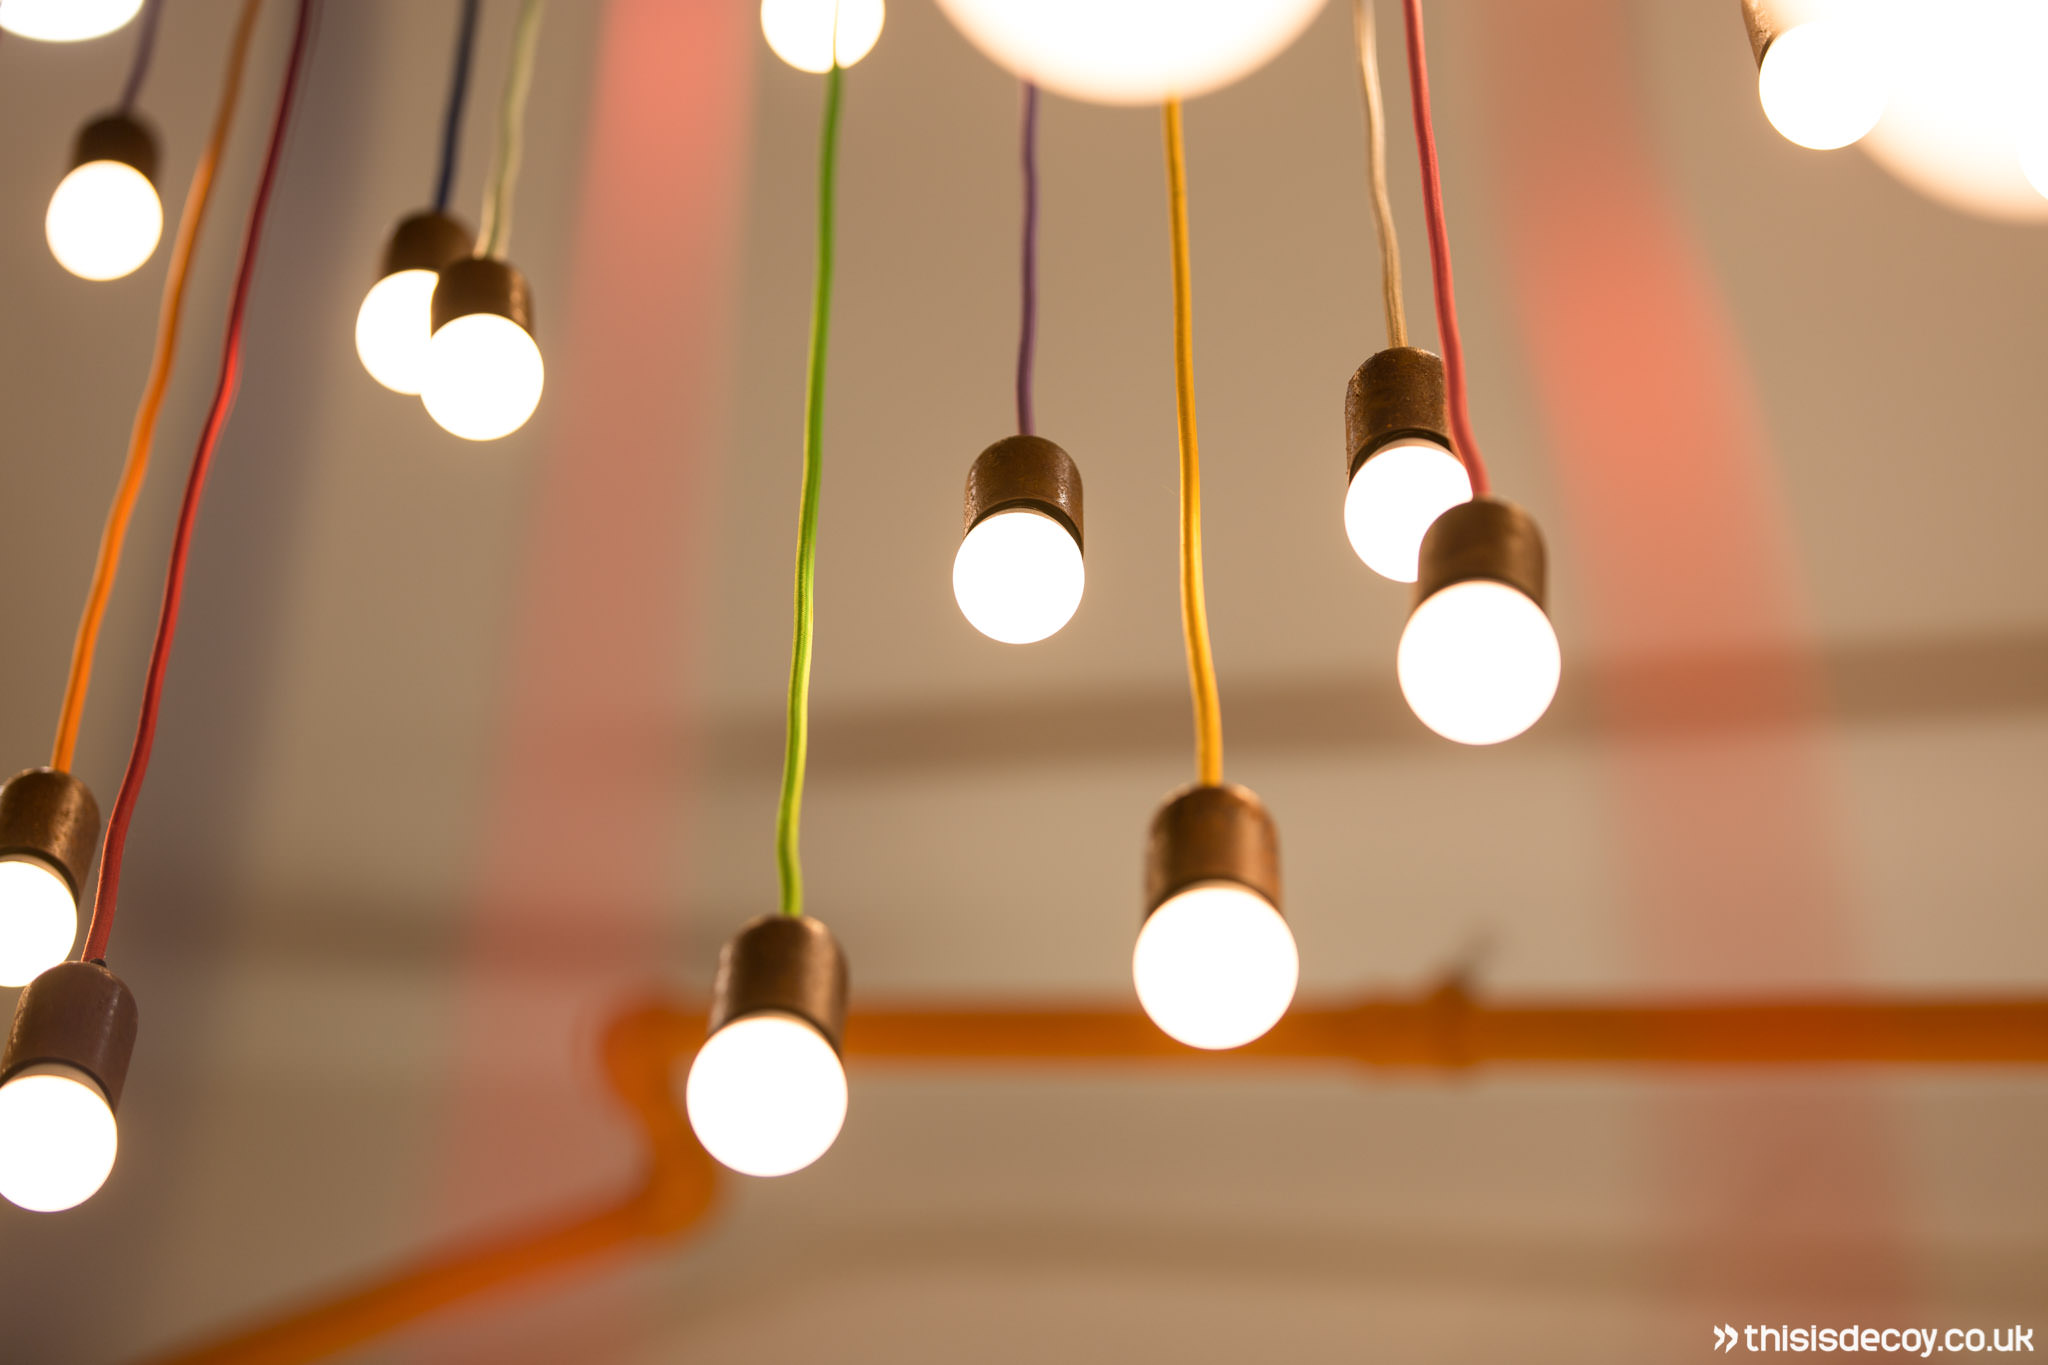 detail of light fixtures